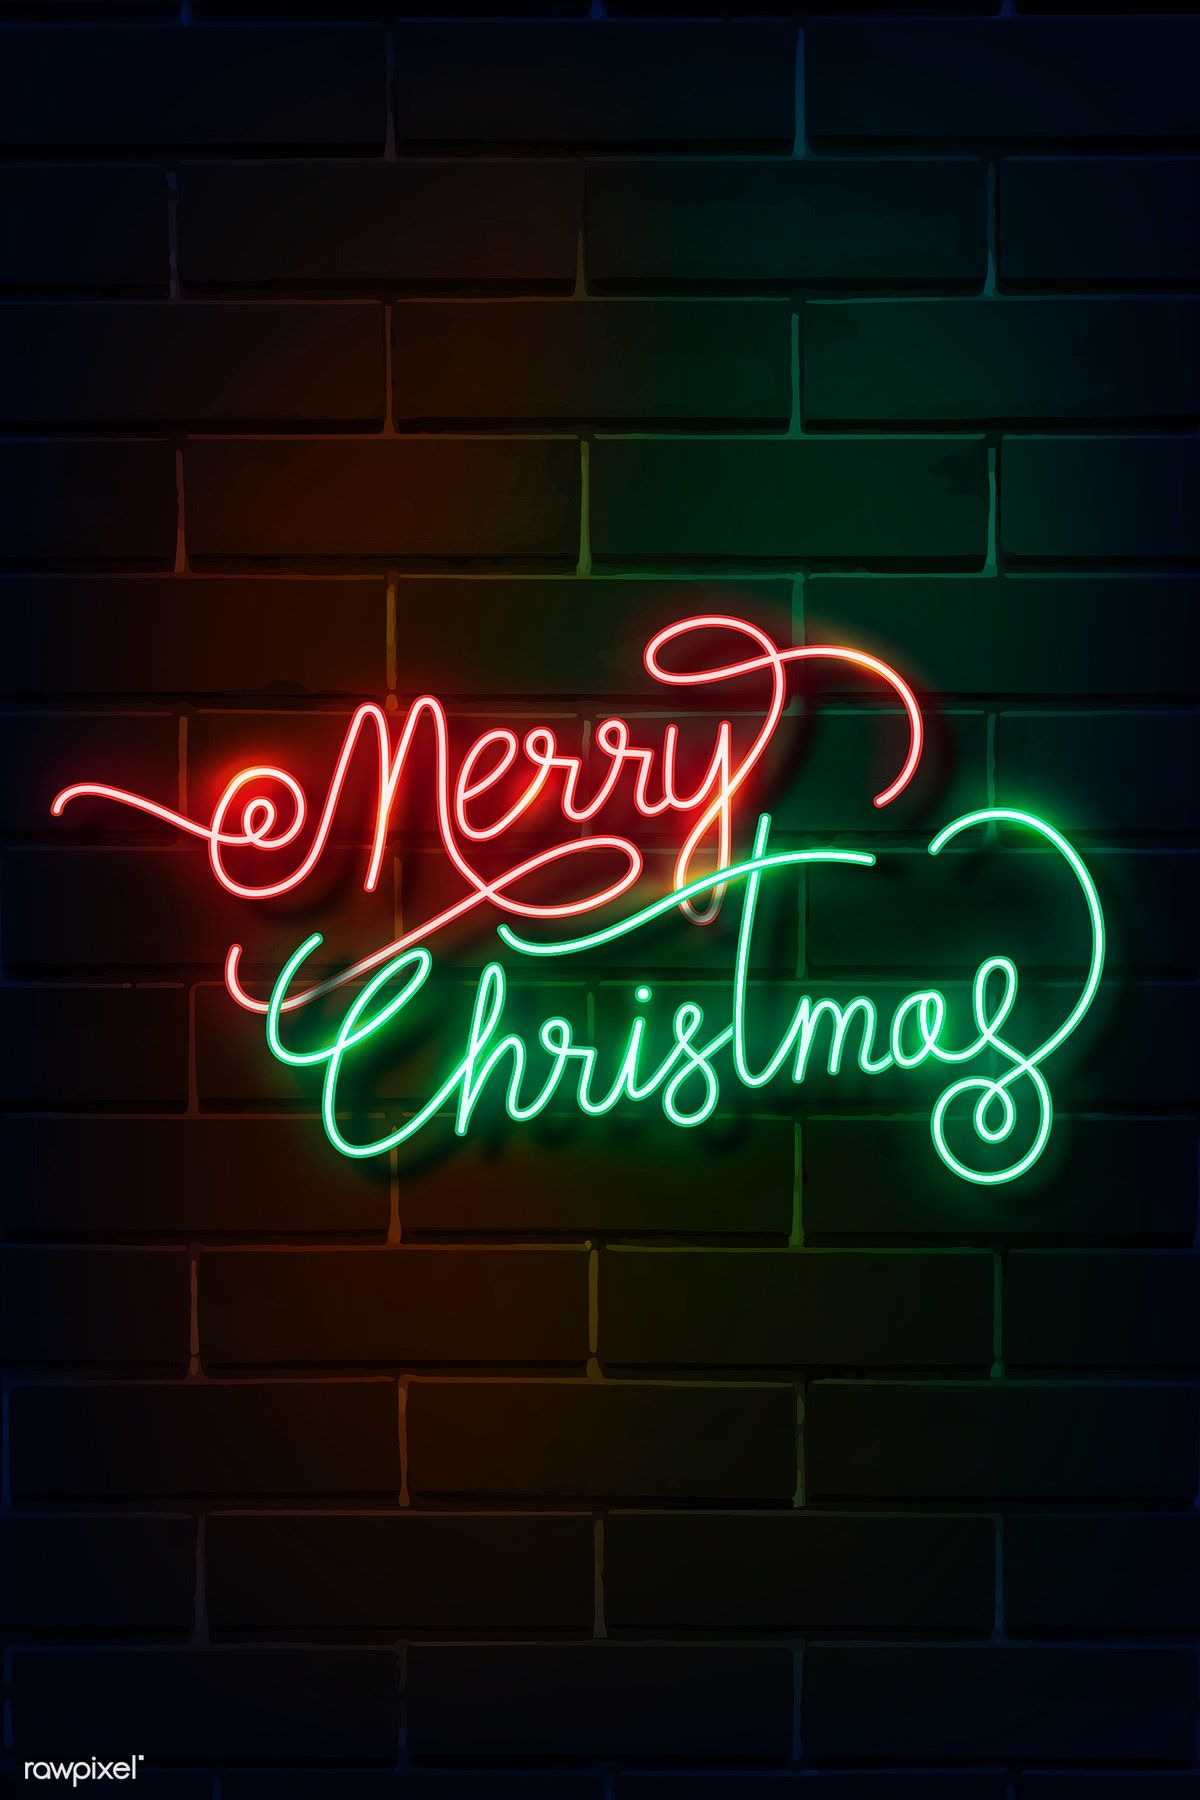 Download Premium Vector Of Merry Christmas Neon Sign On A Dark Brick Wall Xmas Wallpaper Neon Signs Merry Christmas Wallpaper